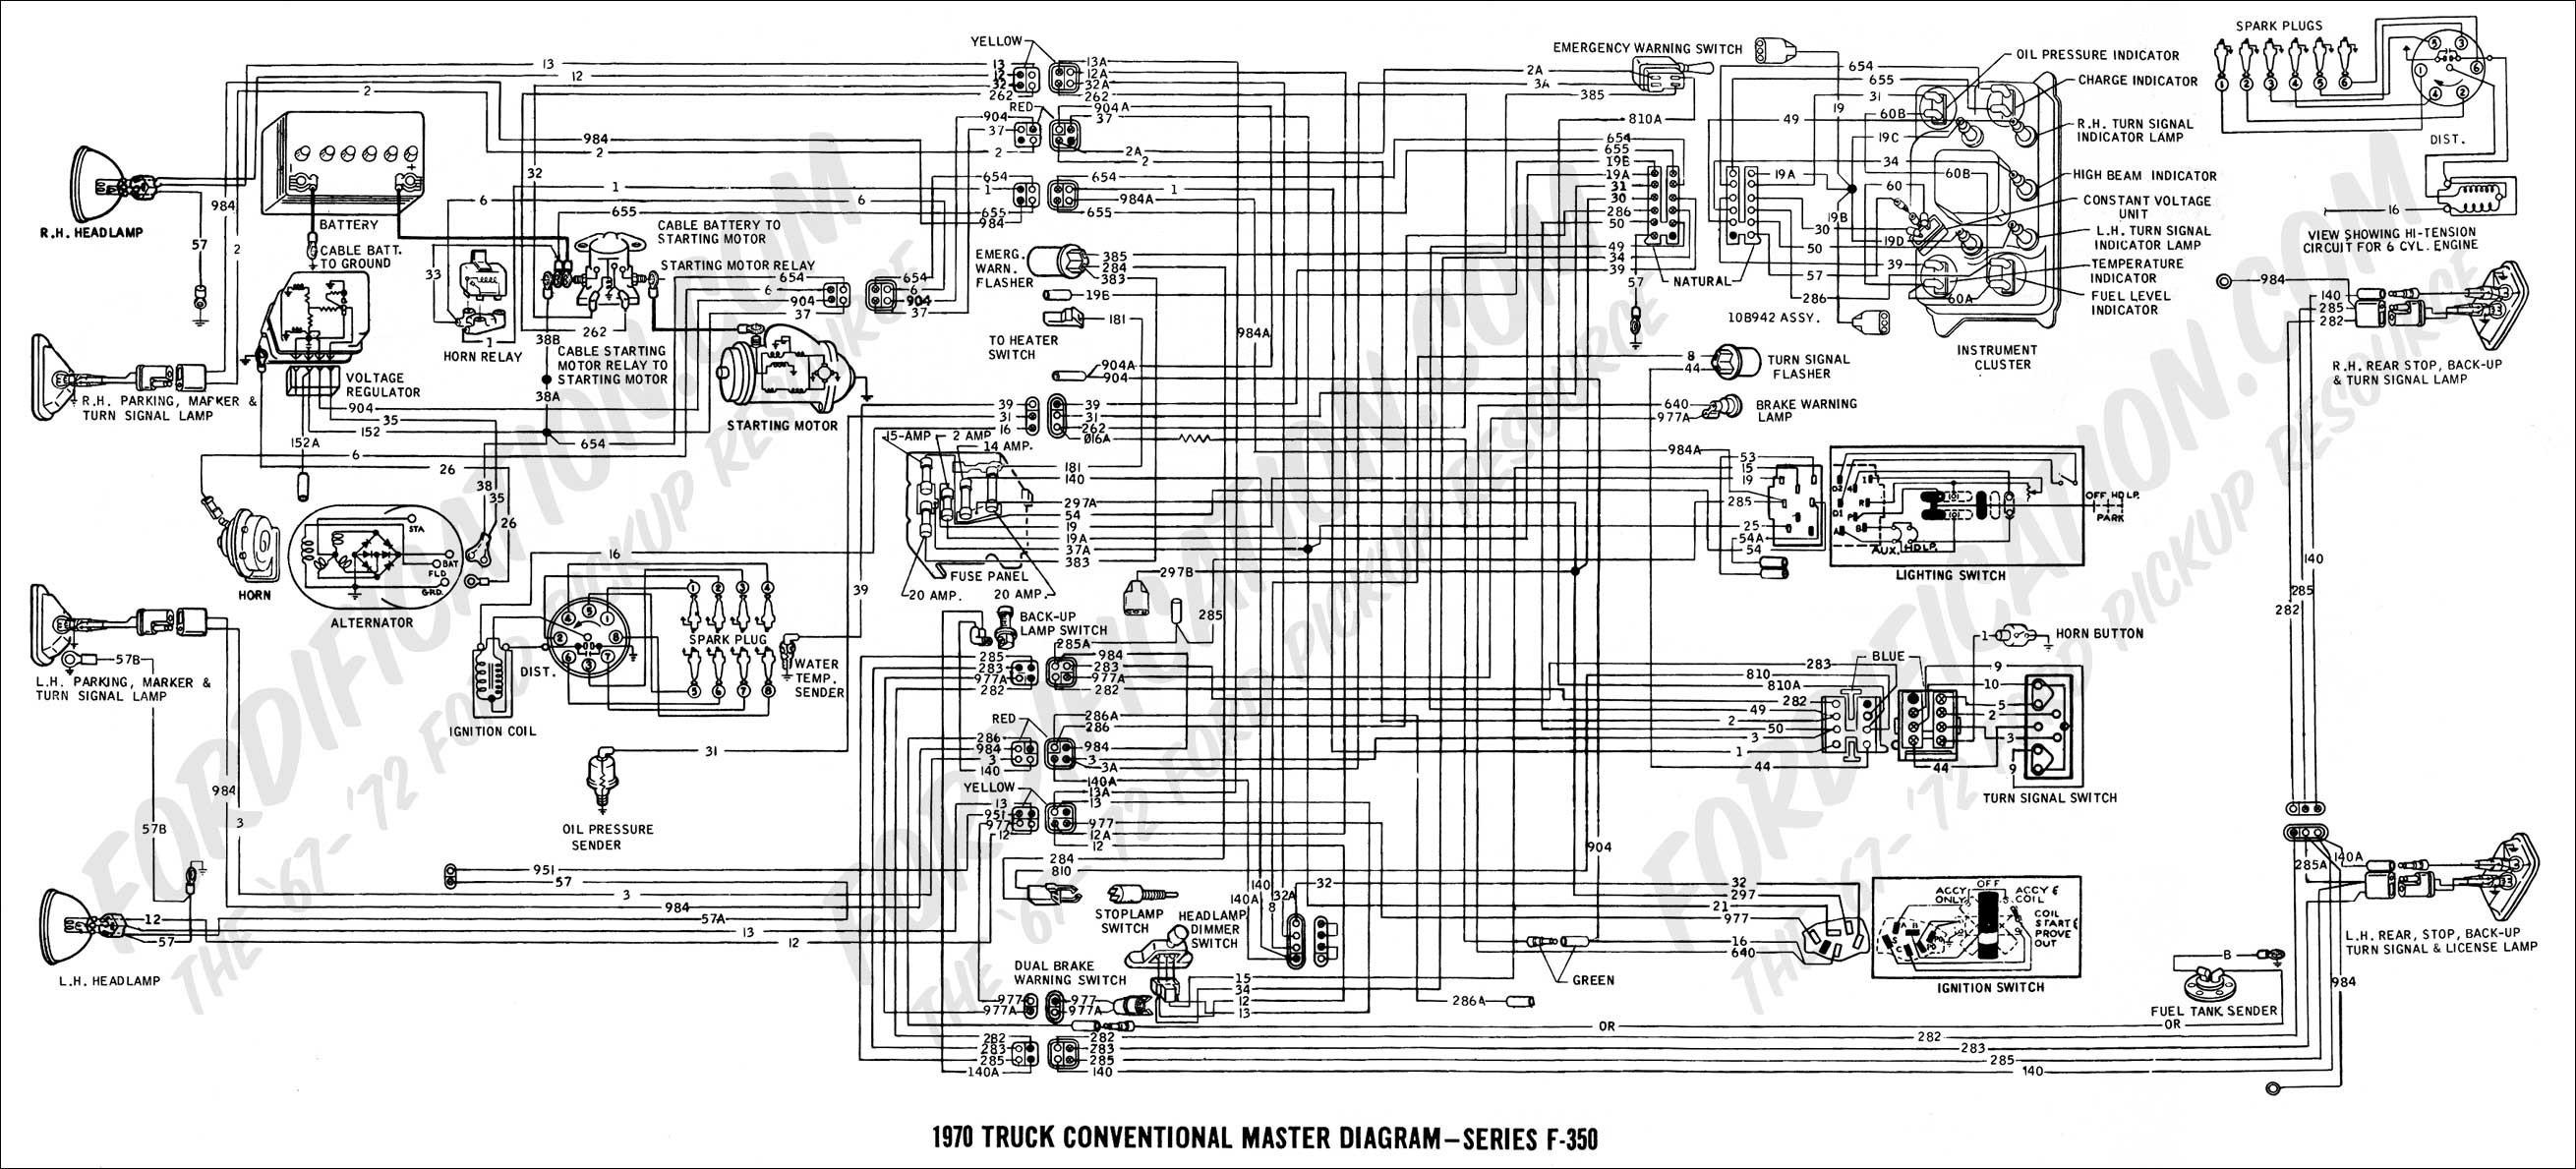 ford f250 trailer wiring diagram inspirational 2003 ford f350 wiring diagram 37 7 blade trailer of ford f250 trailer wiring diagram